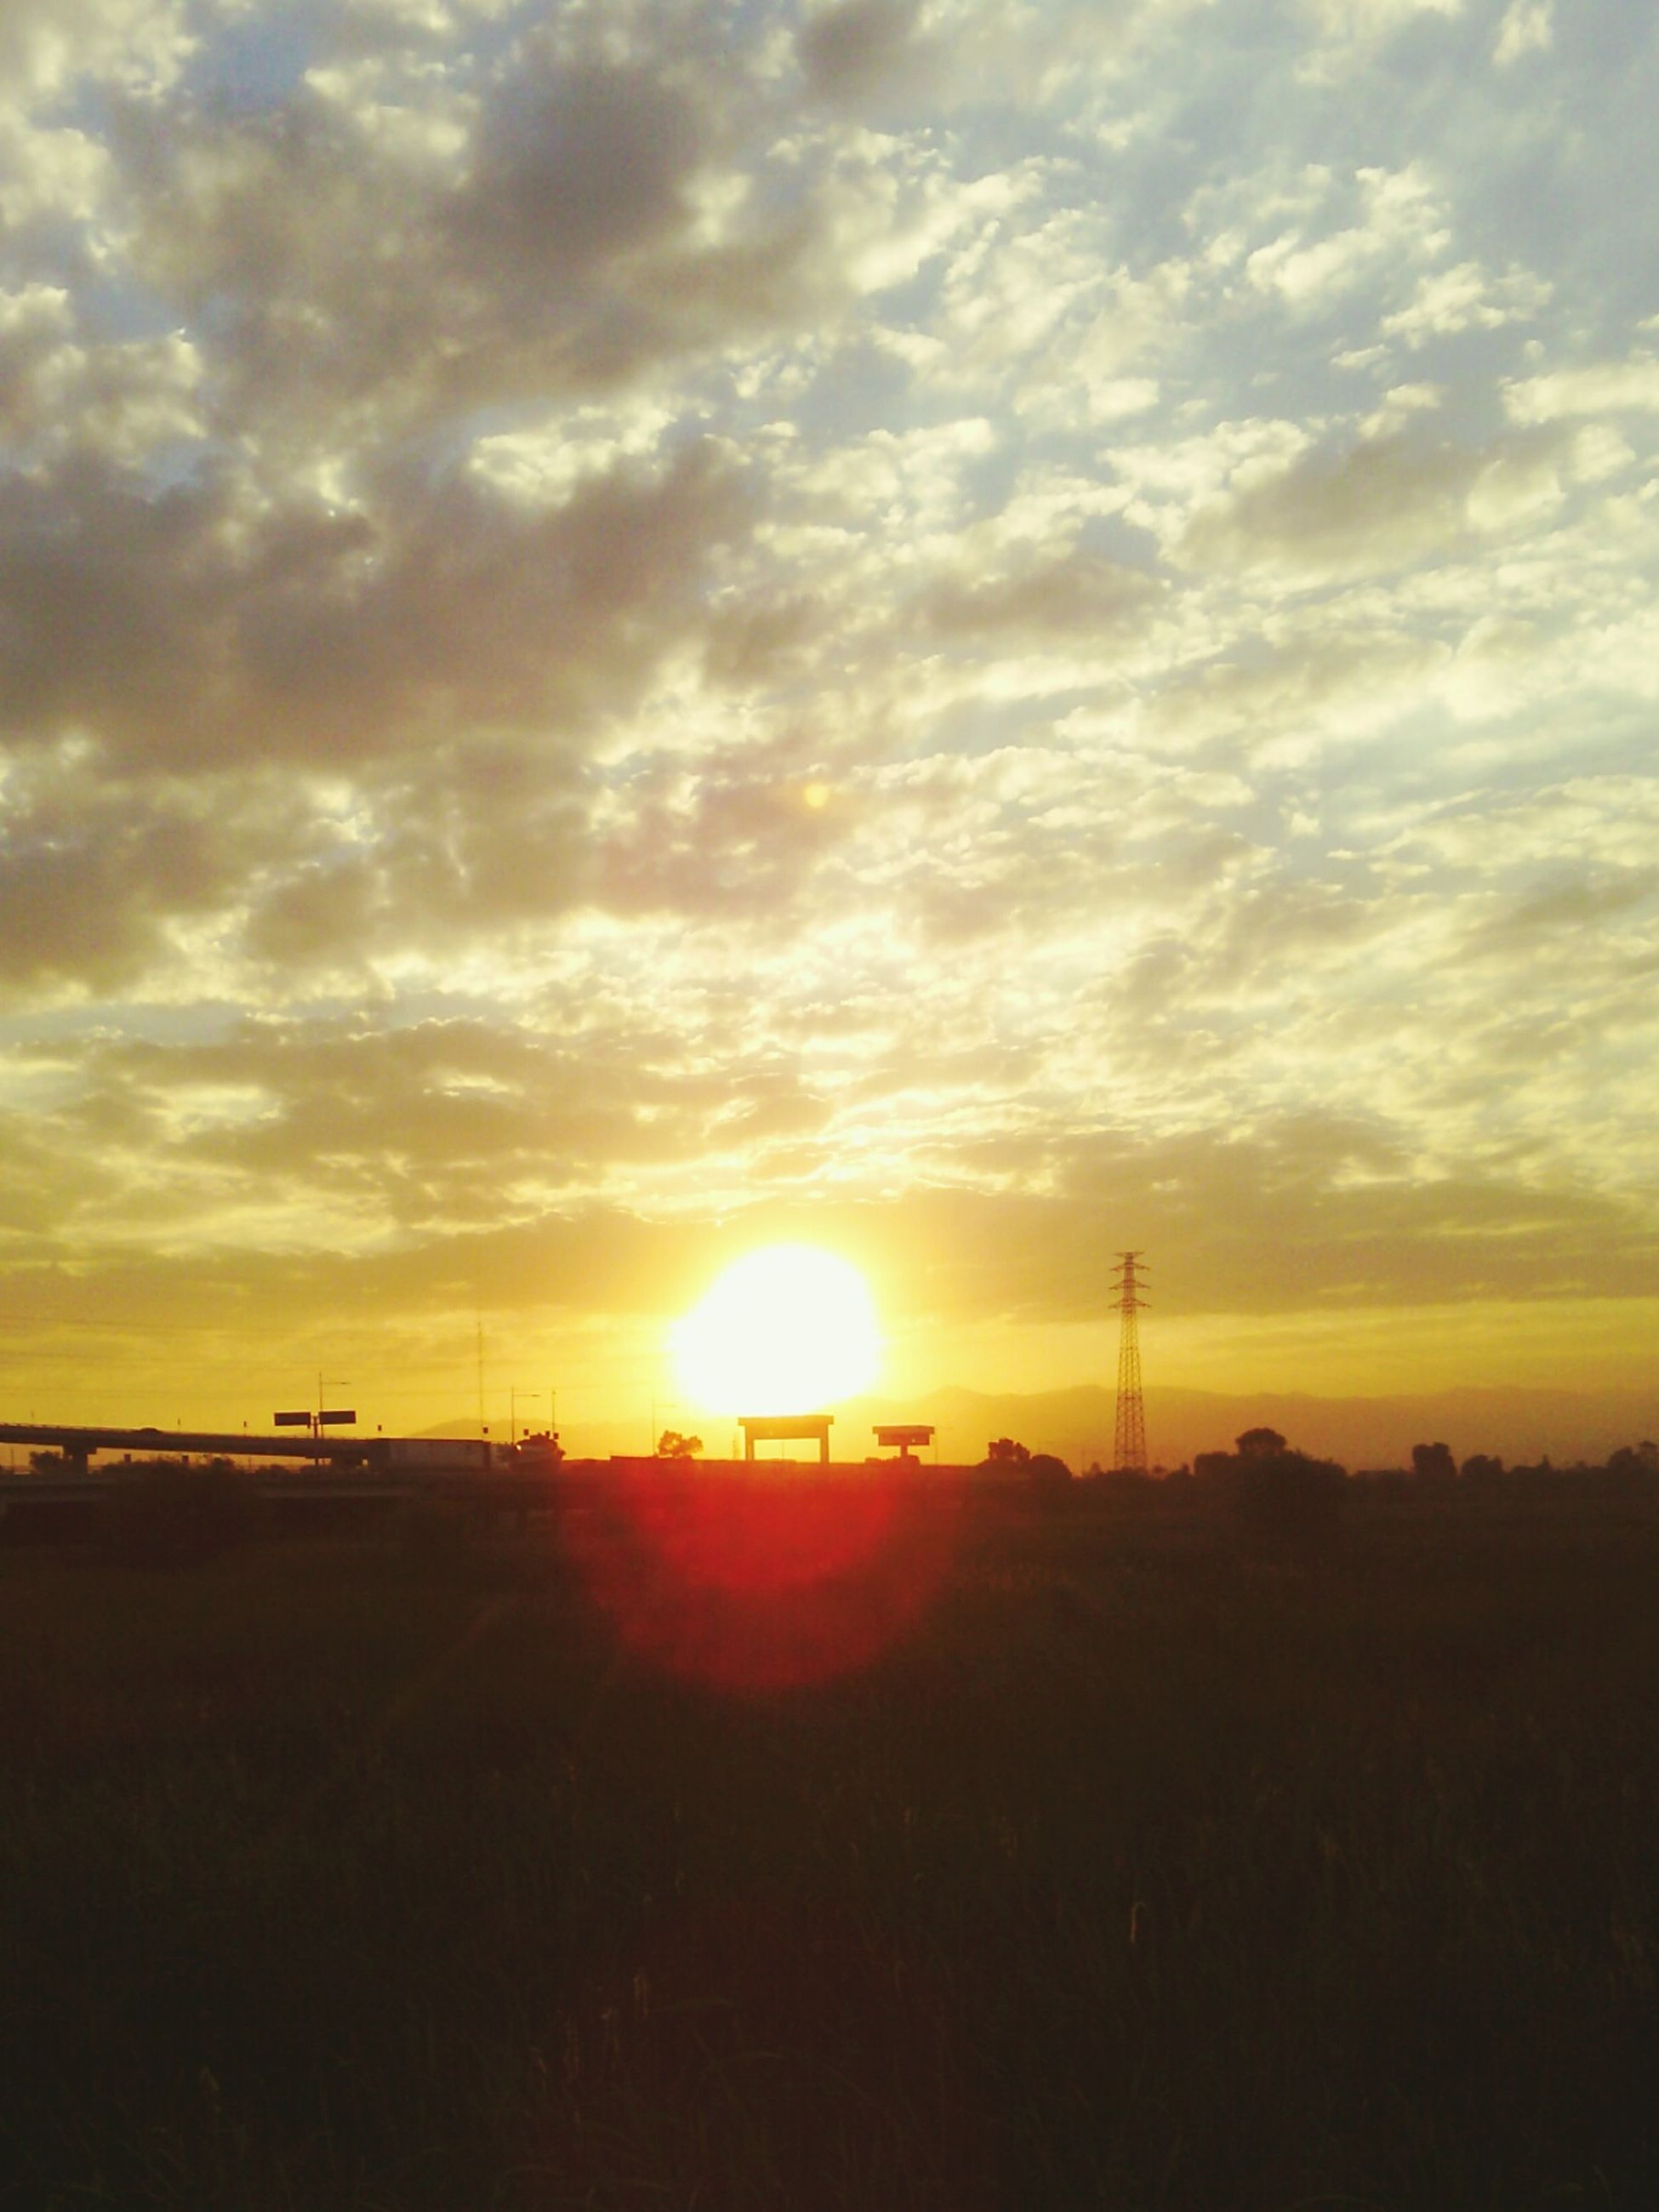 sunset, sunlight, sun, sky, sunbeam, beauty in nature, nature, cloud - sky, no people, field, outdoors, scenics, landscape, tree, day